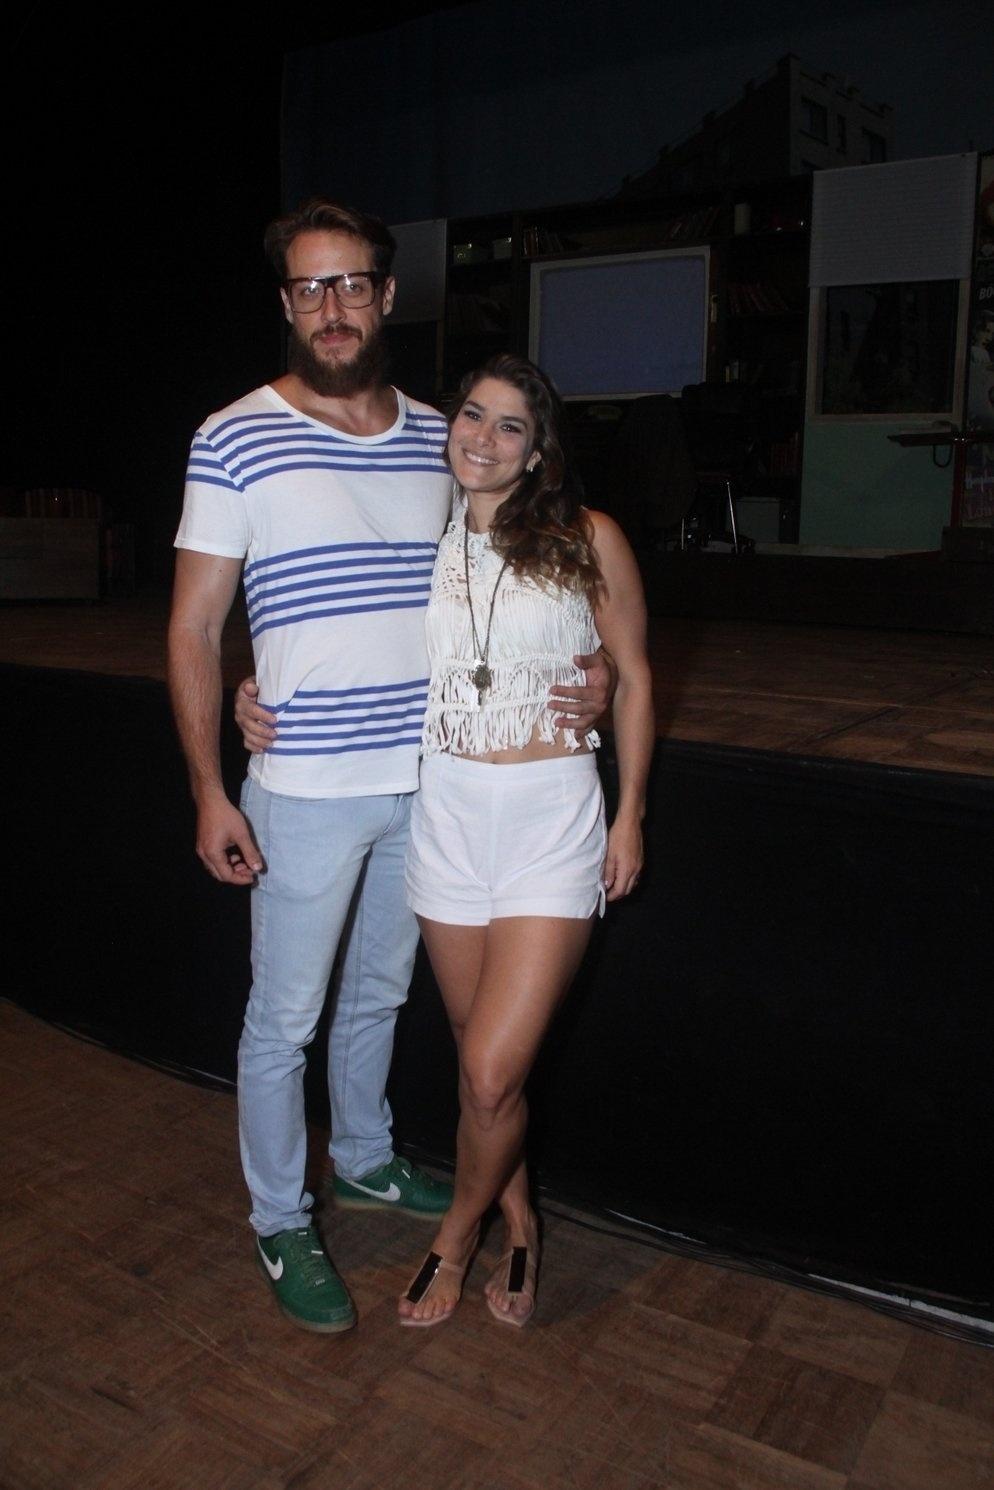 16.jan.2015 - Priscila Fantin e o marido, Renan Abreu, logo após a estreia do espetáculo